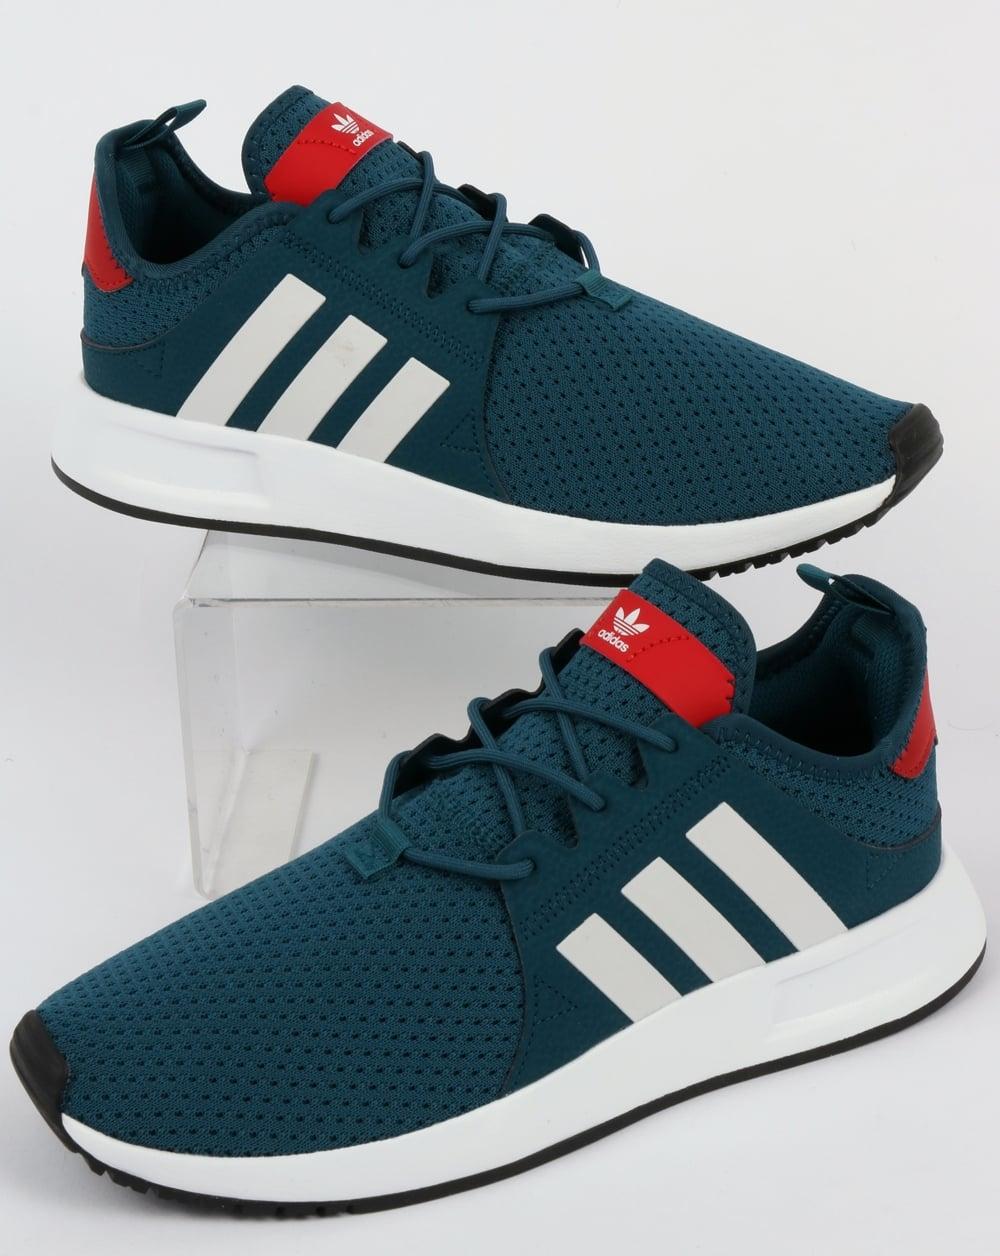 Adidas XPLR, Trainers, Petrol, blue